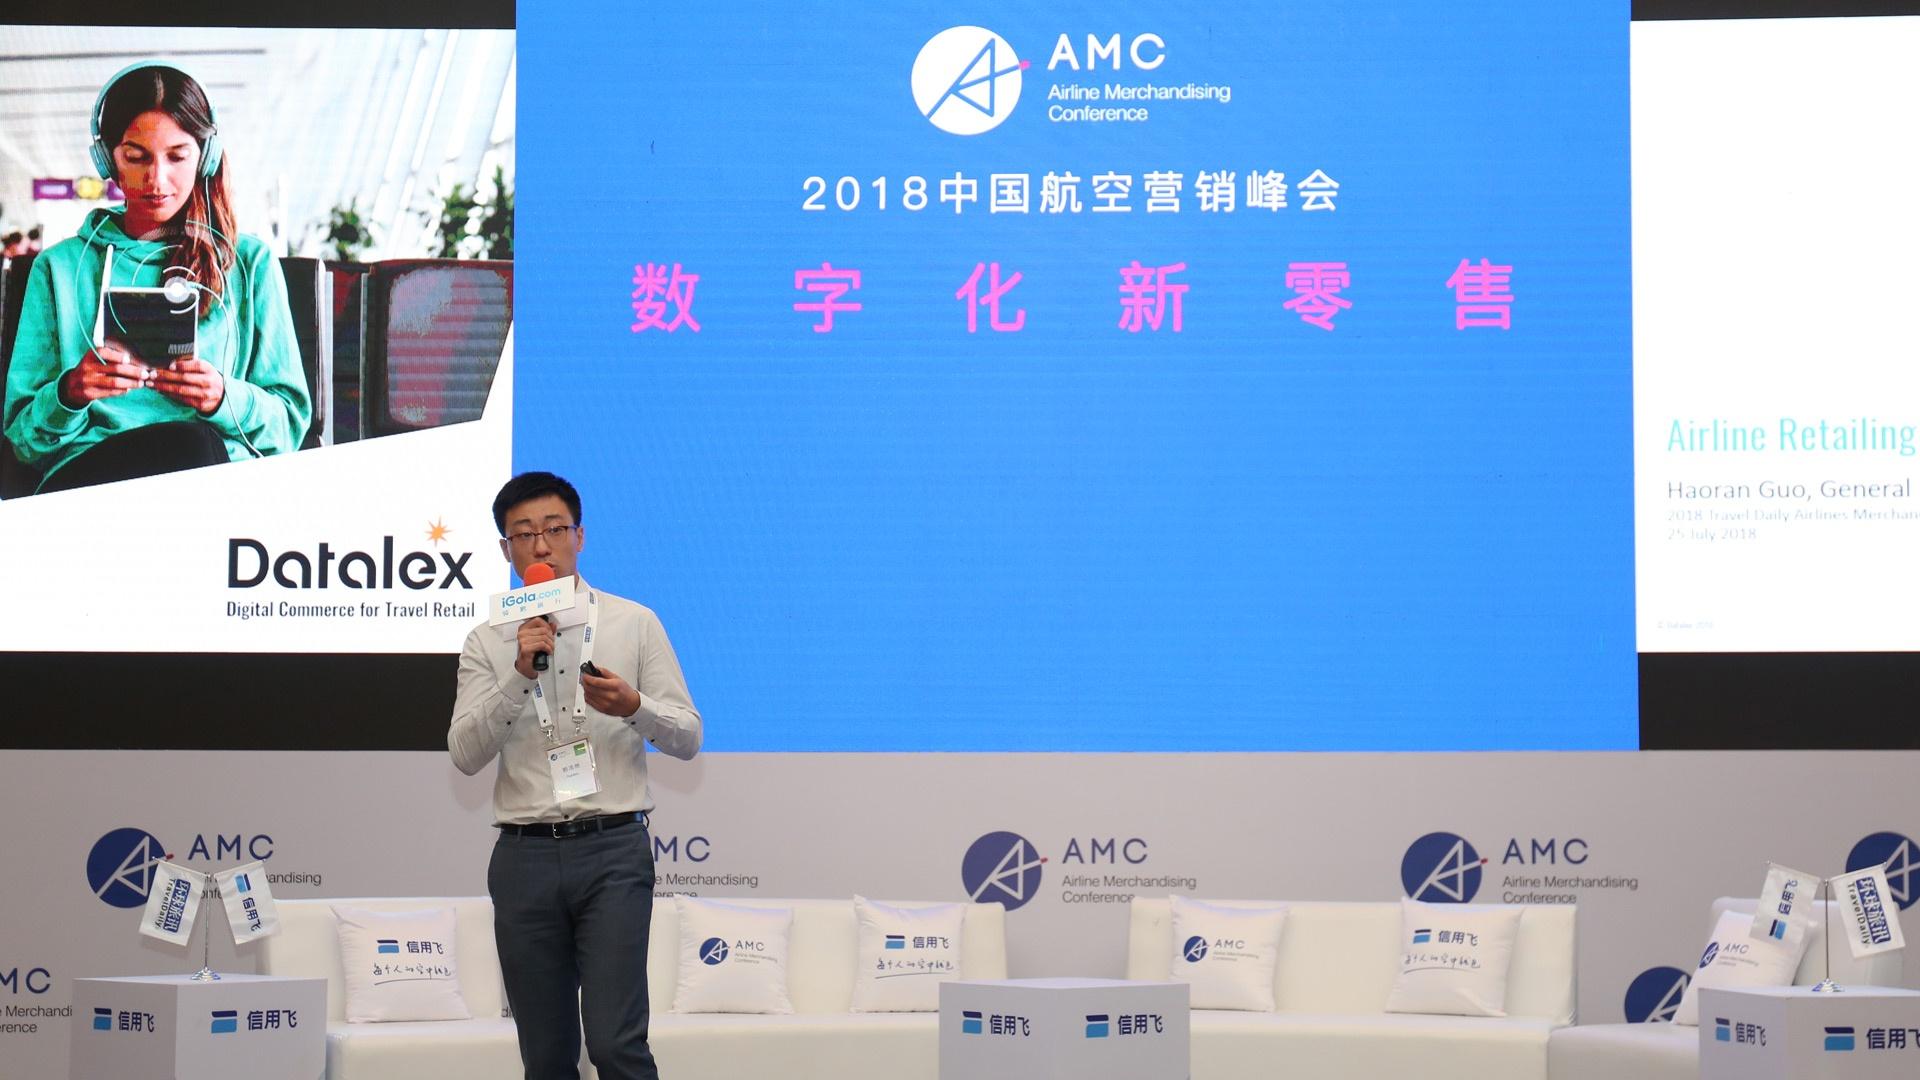 Chris Kwok Keynote Speaker at AMC